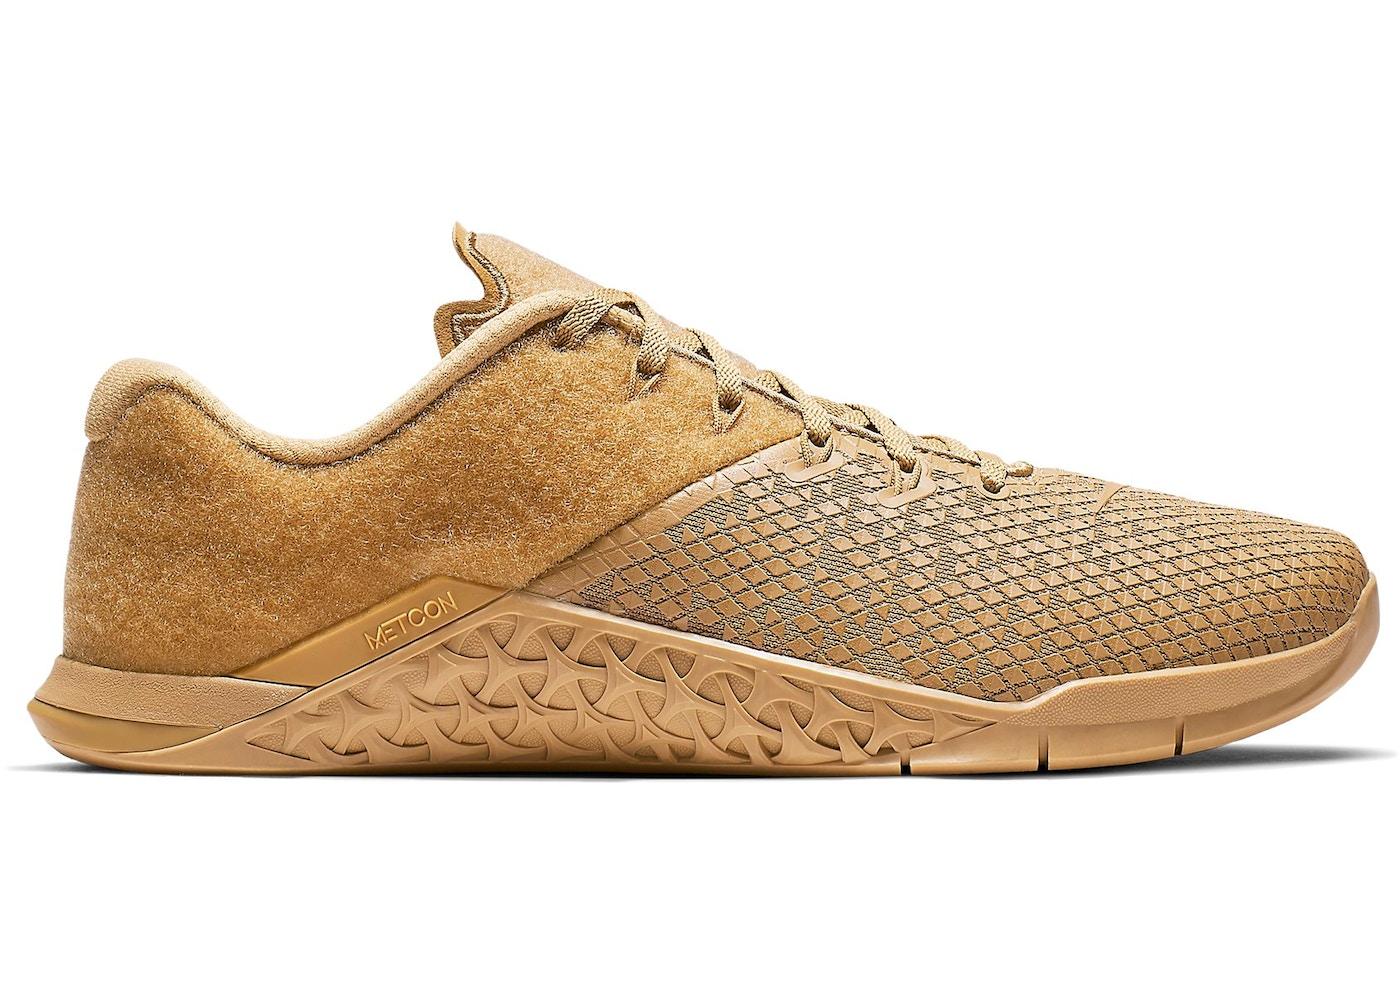 f5e32e5000 Nike Metcon 4 Patches Elemental Gold - BQ3088-700